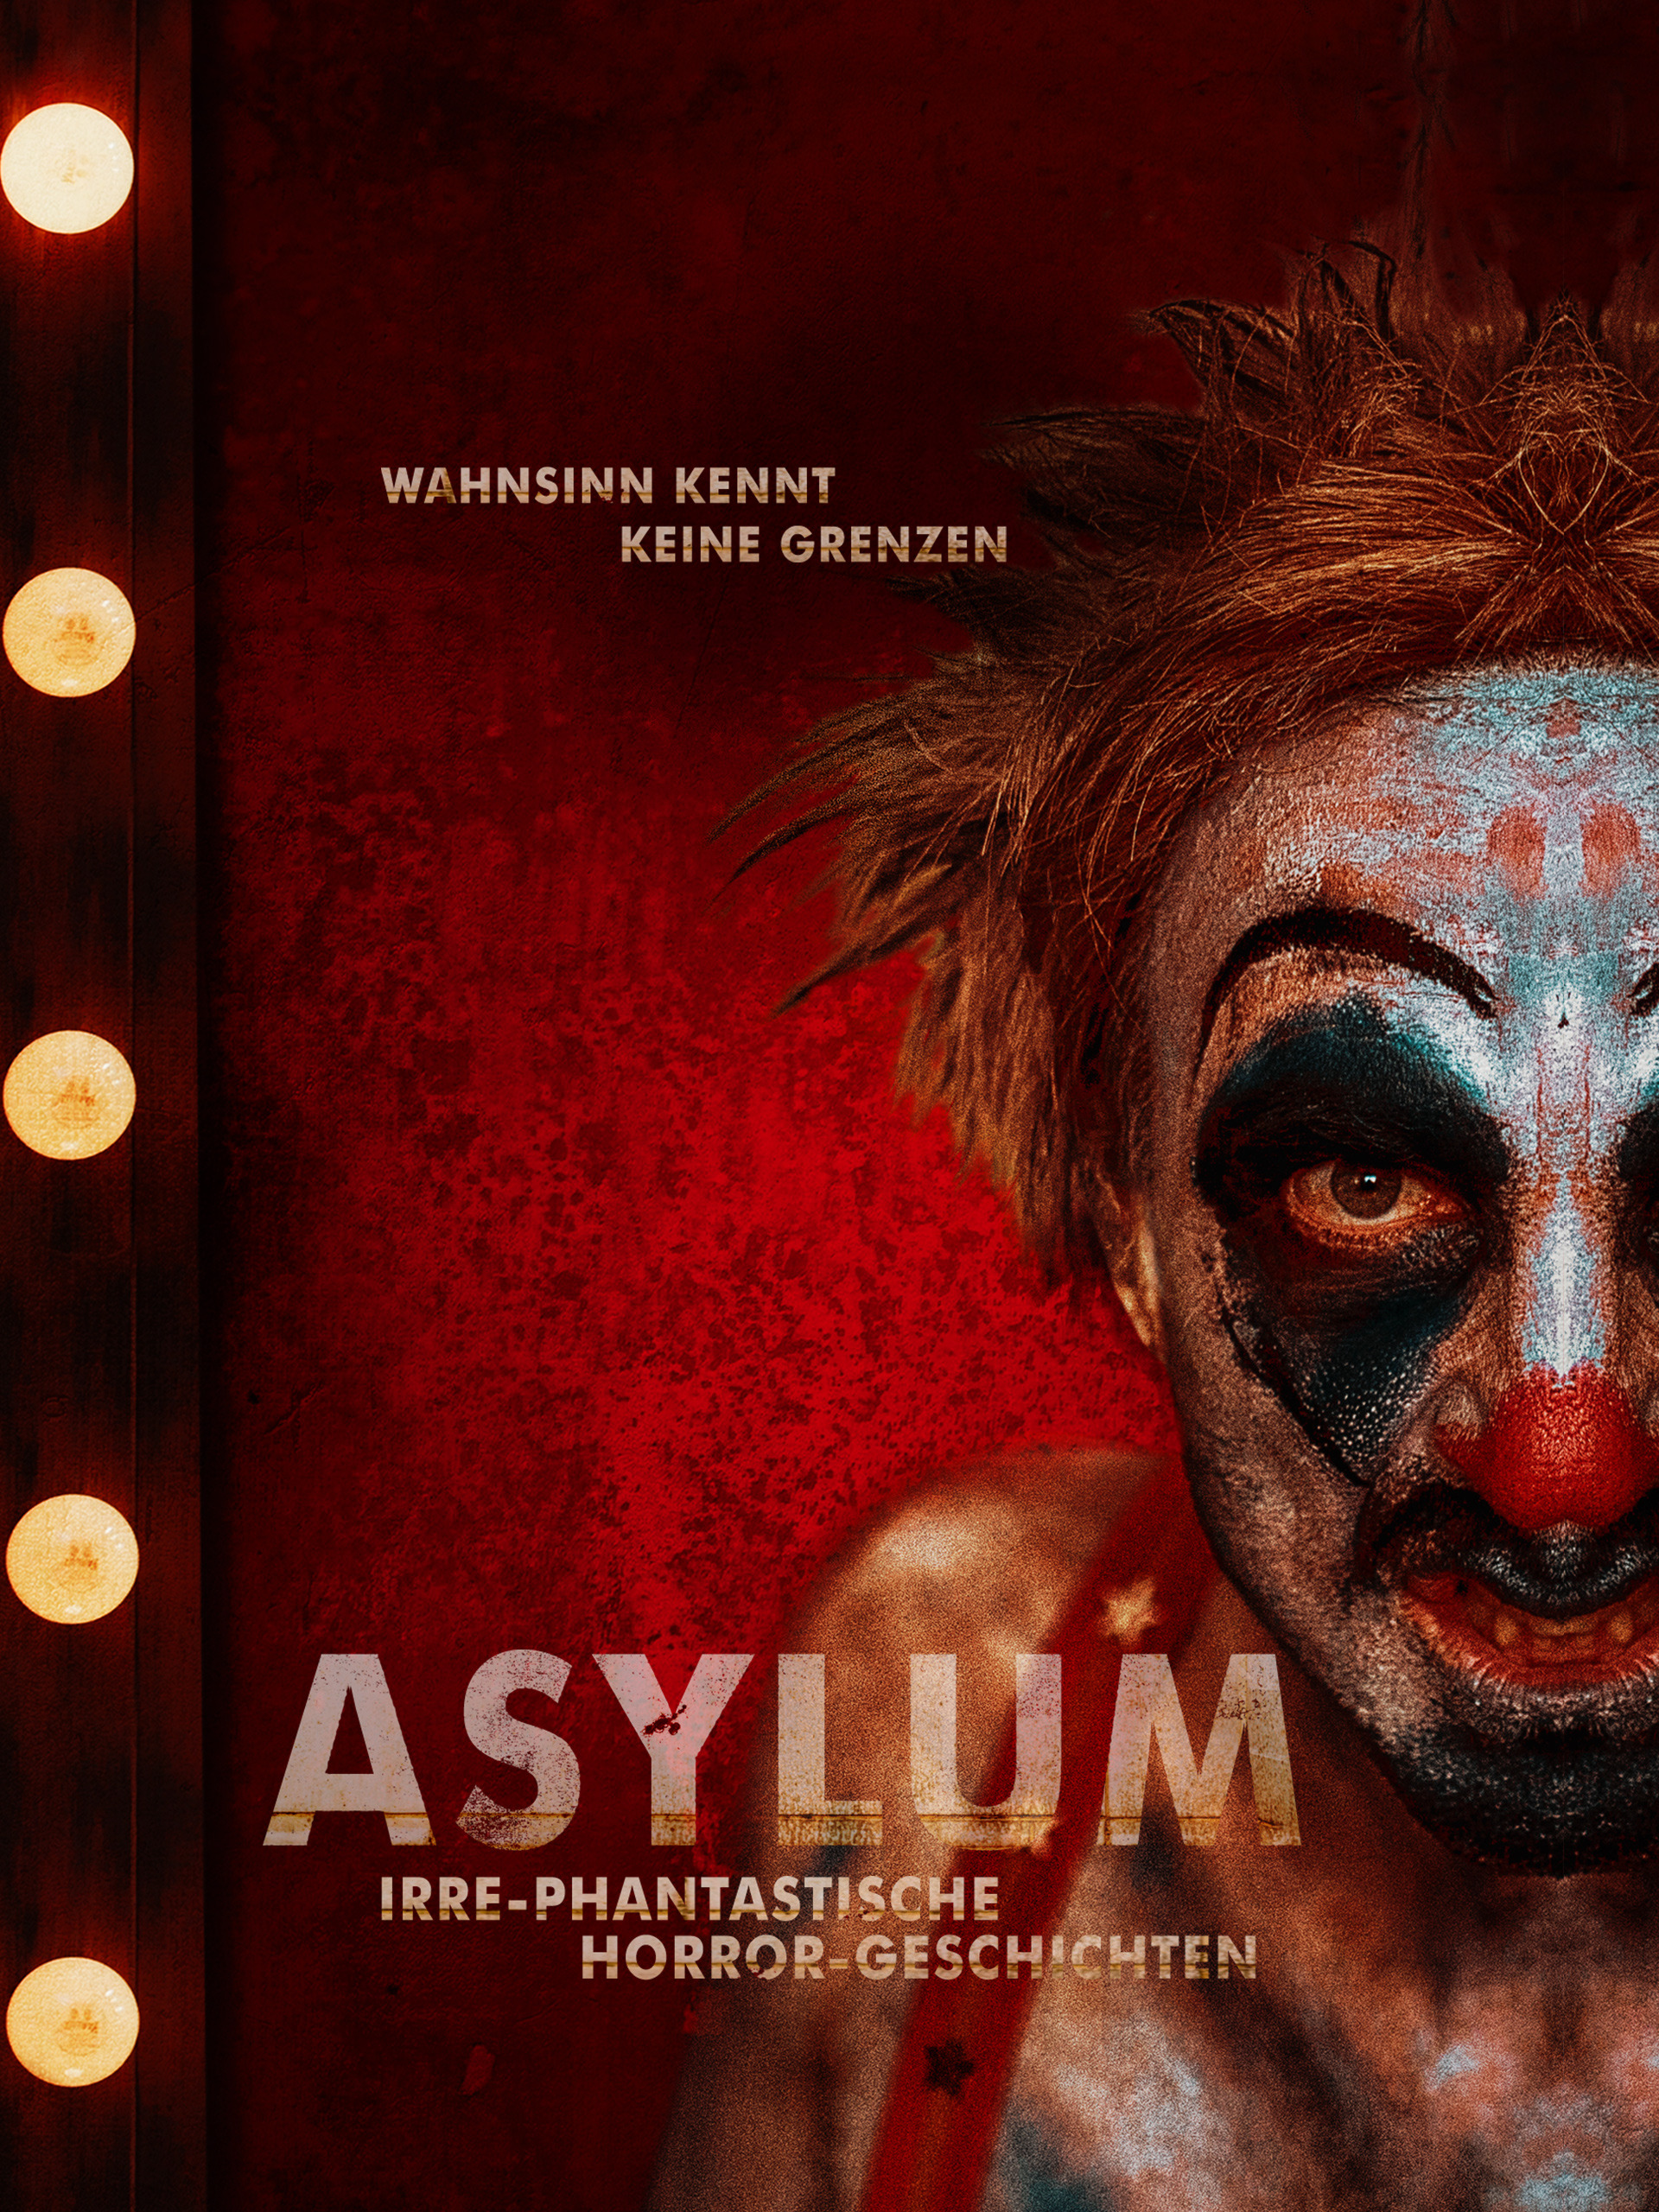 Asylum - Irre-phantastische Horror-Geschichten